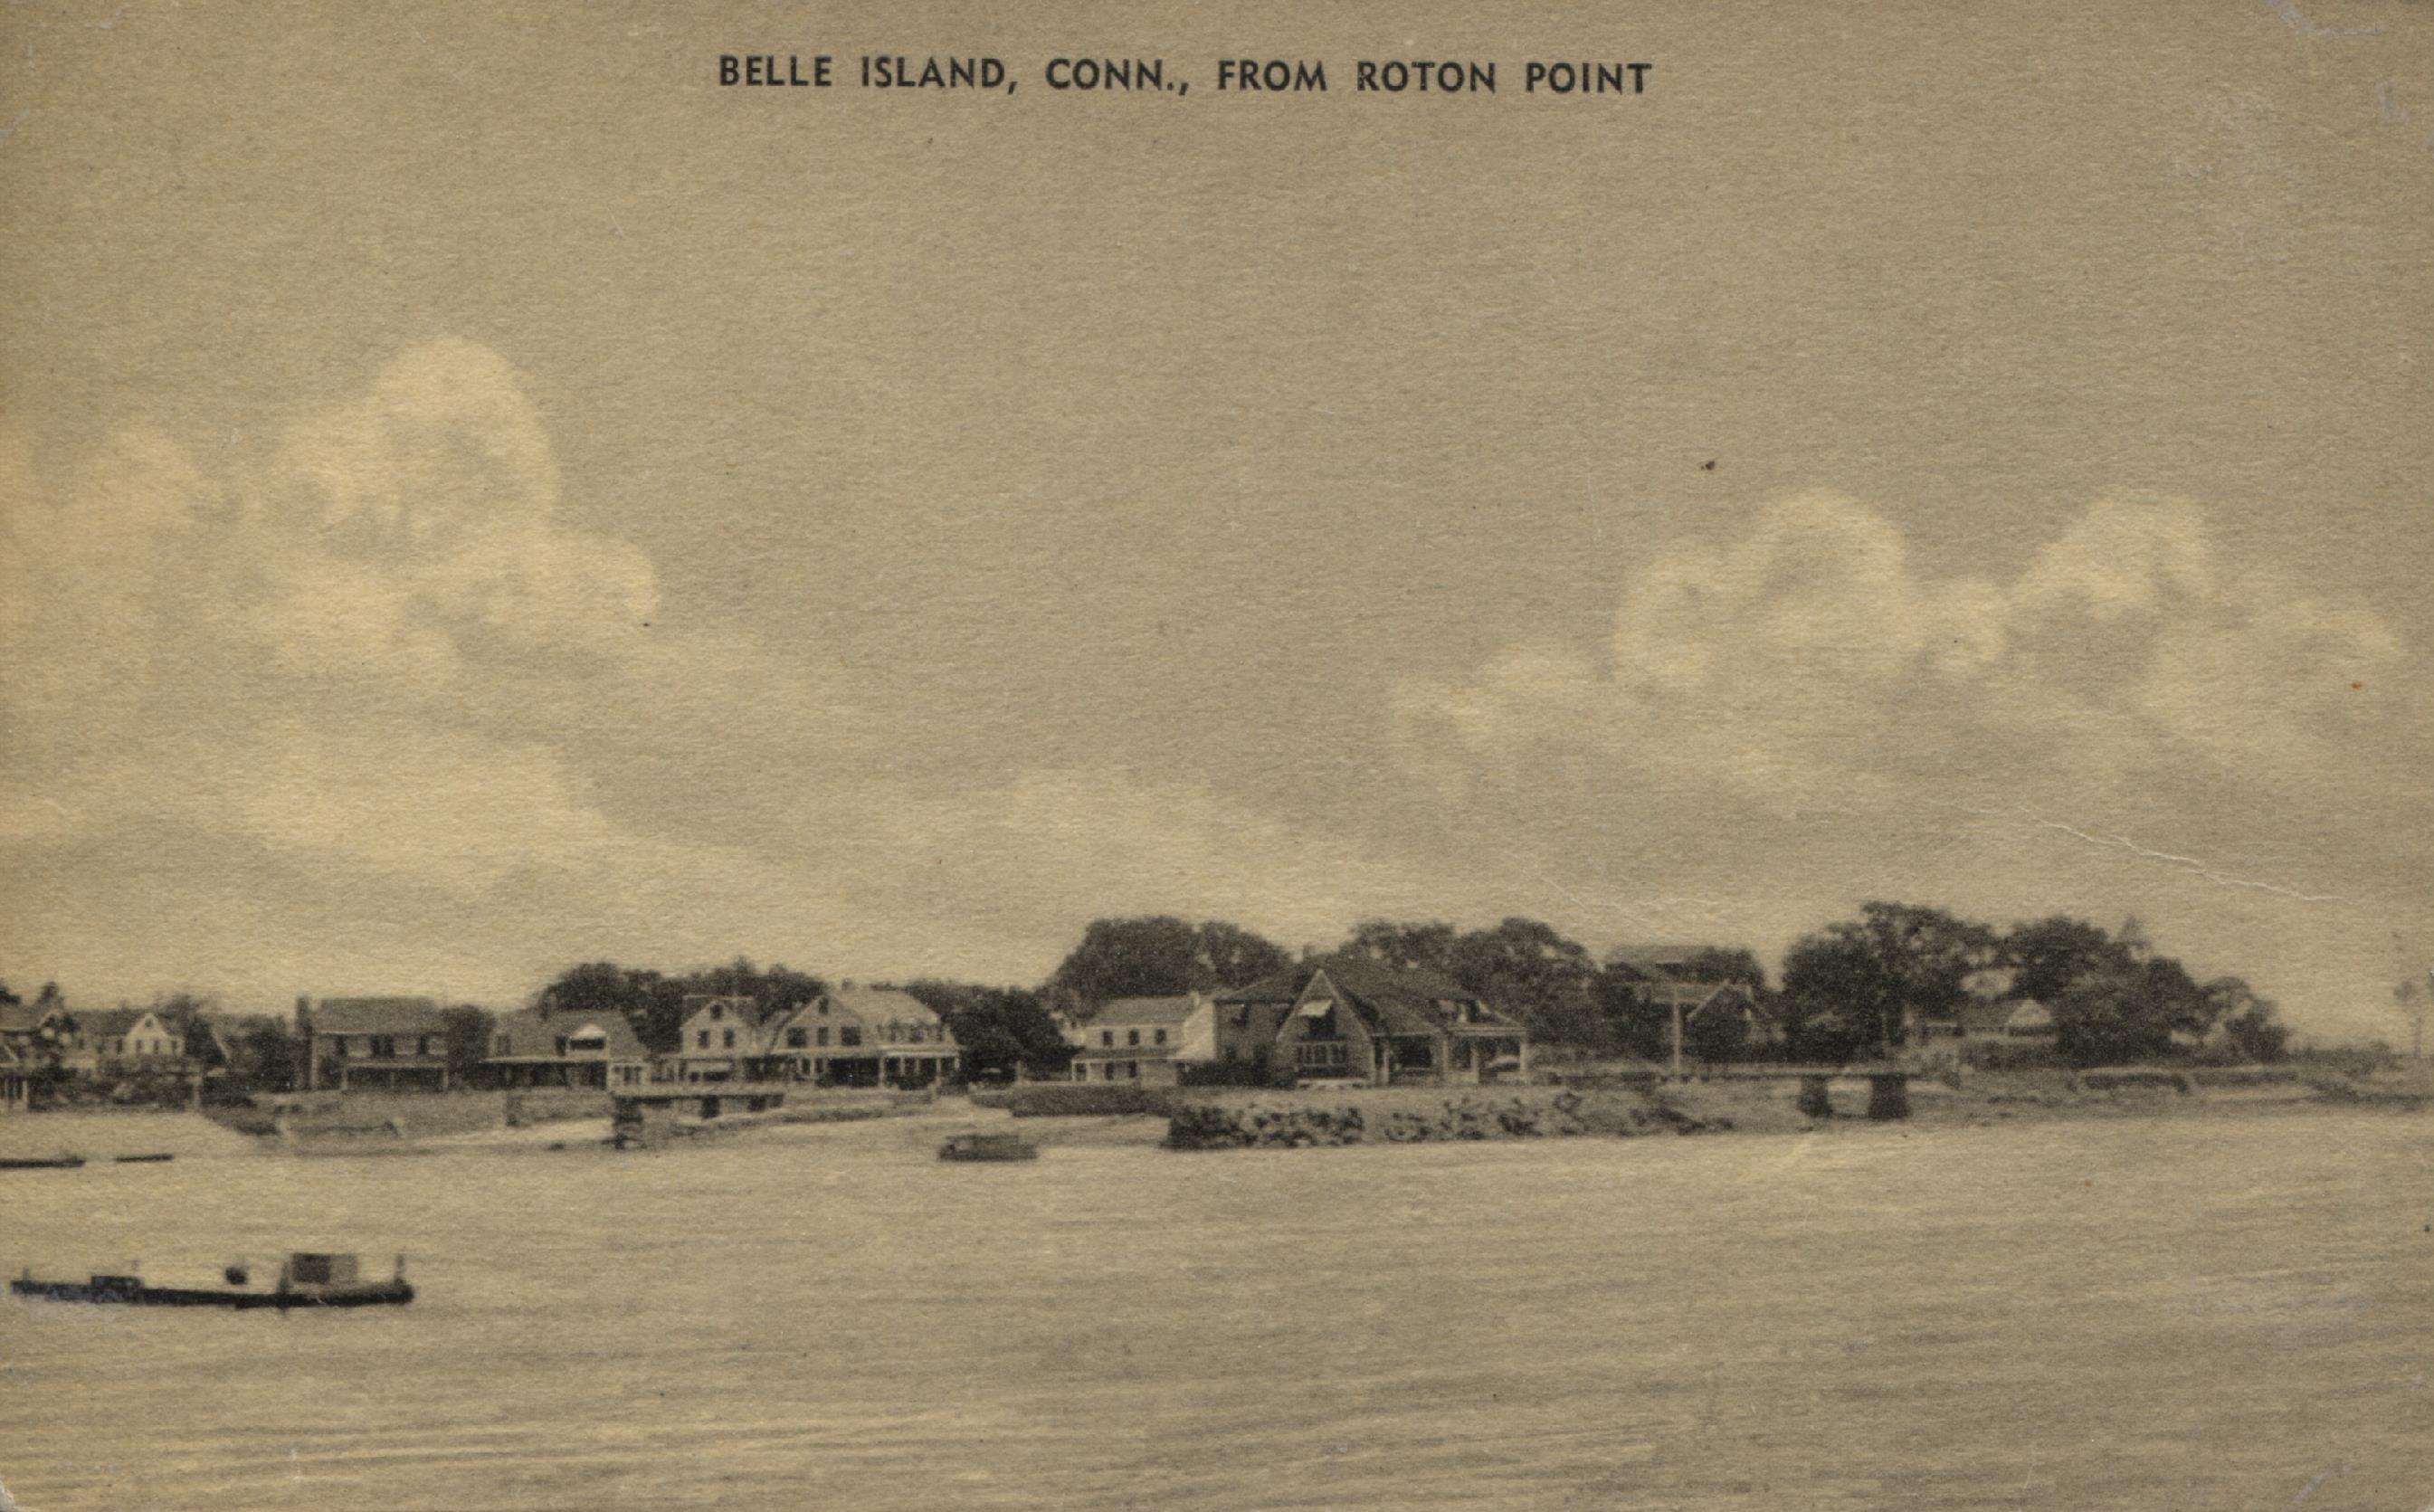 61.14.5 Postcard of Belle Island